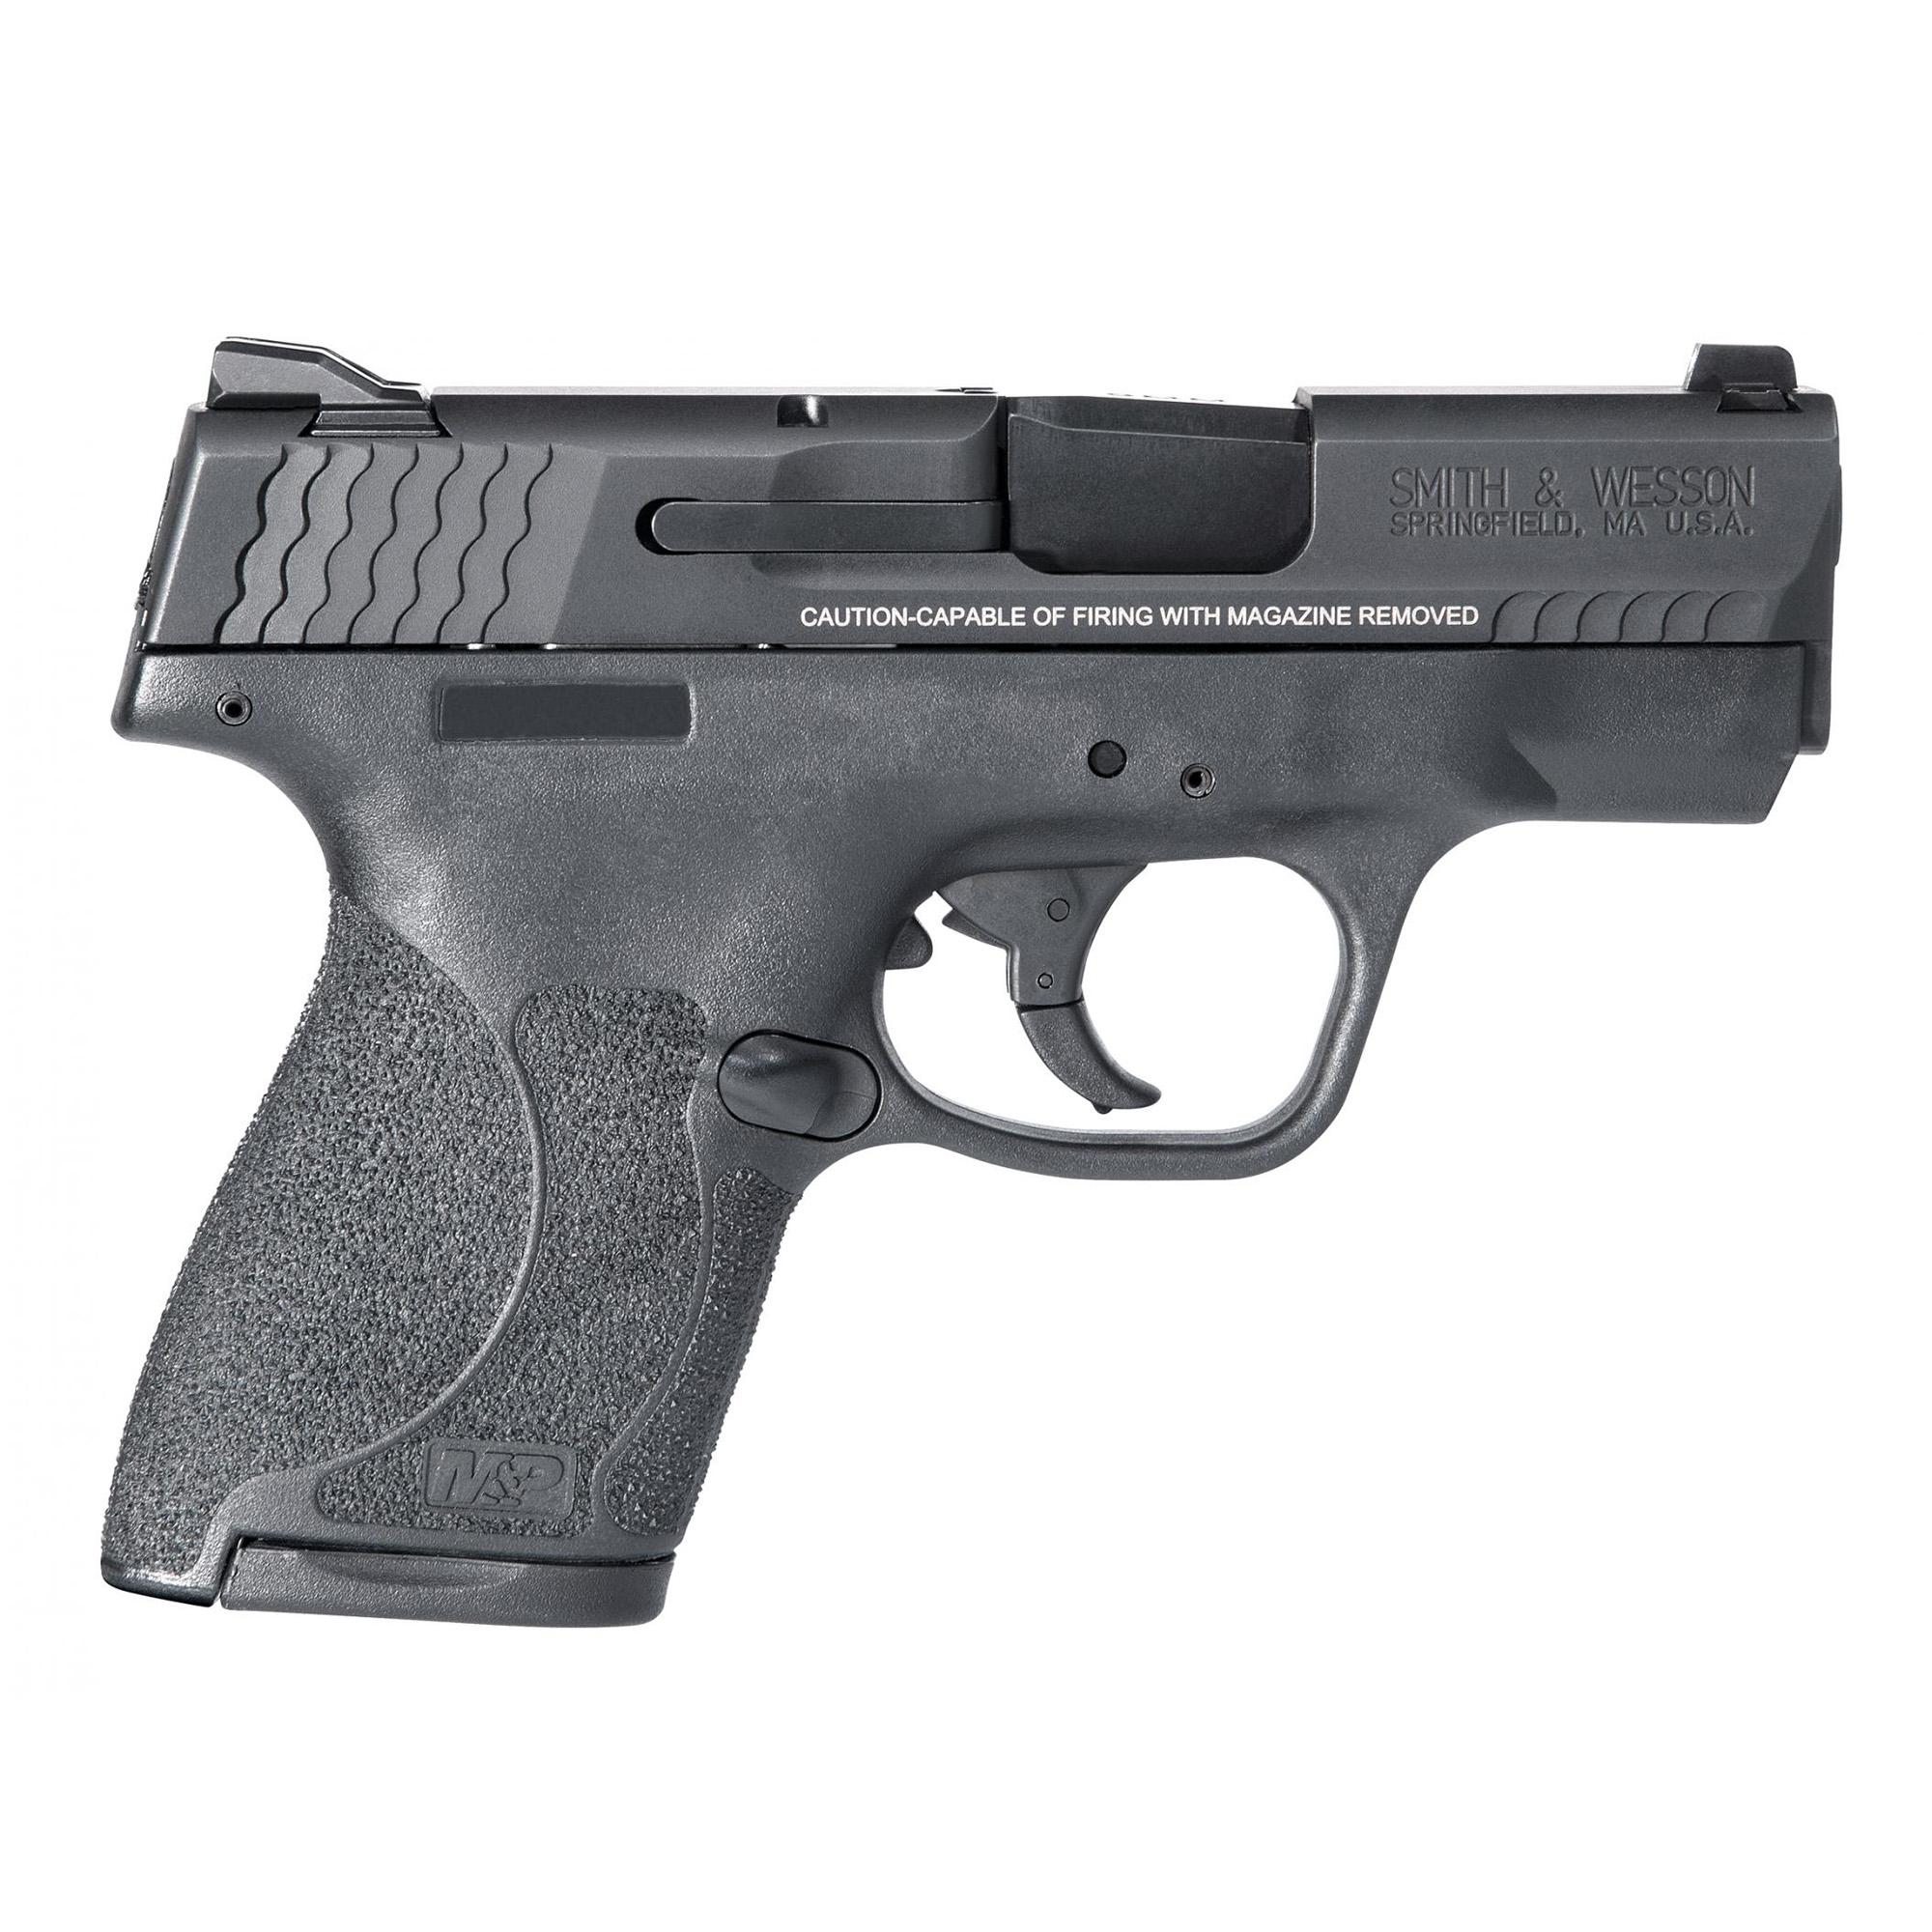 Smith & Wesson M & P9 Shield M2.0 Handgun, Manual Safety